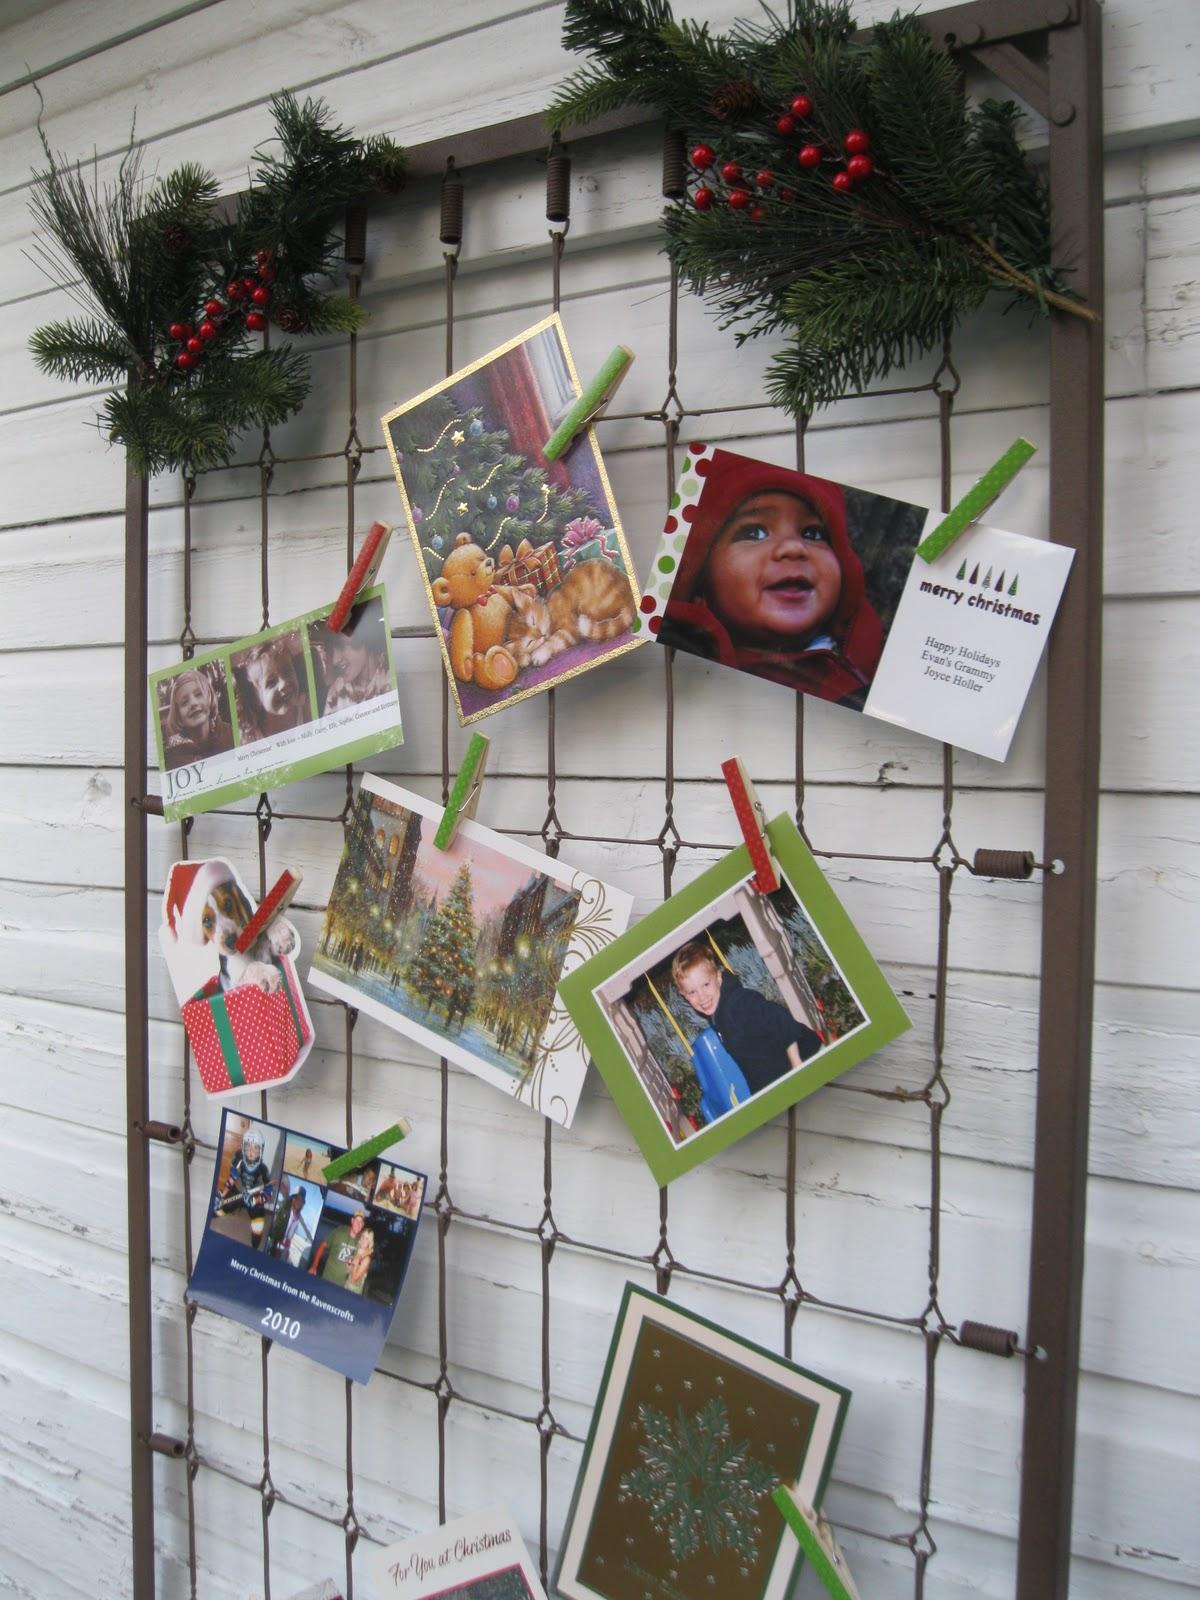 10 christmas card display ideas through the eyes of the mrs - Christmas card display ideas ...